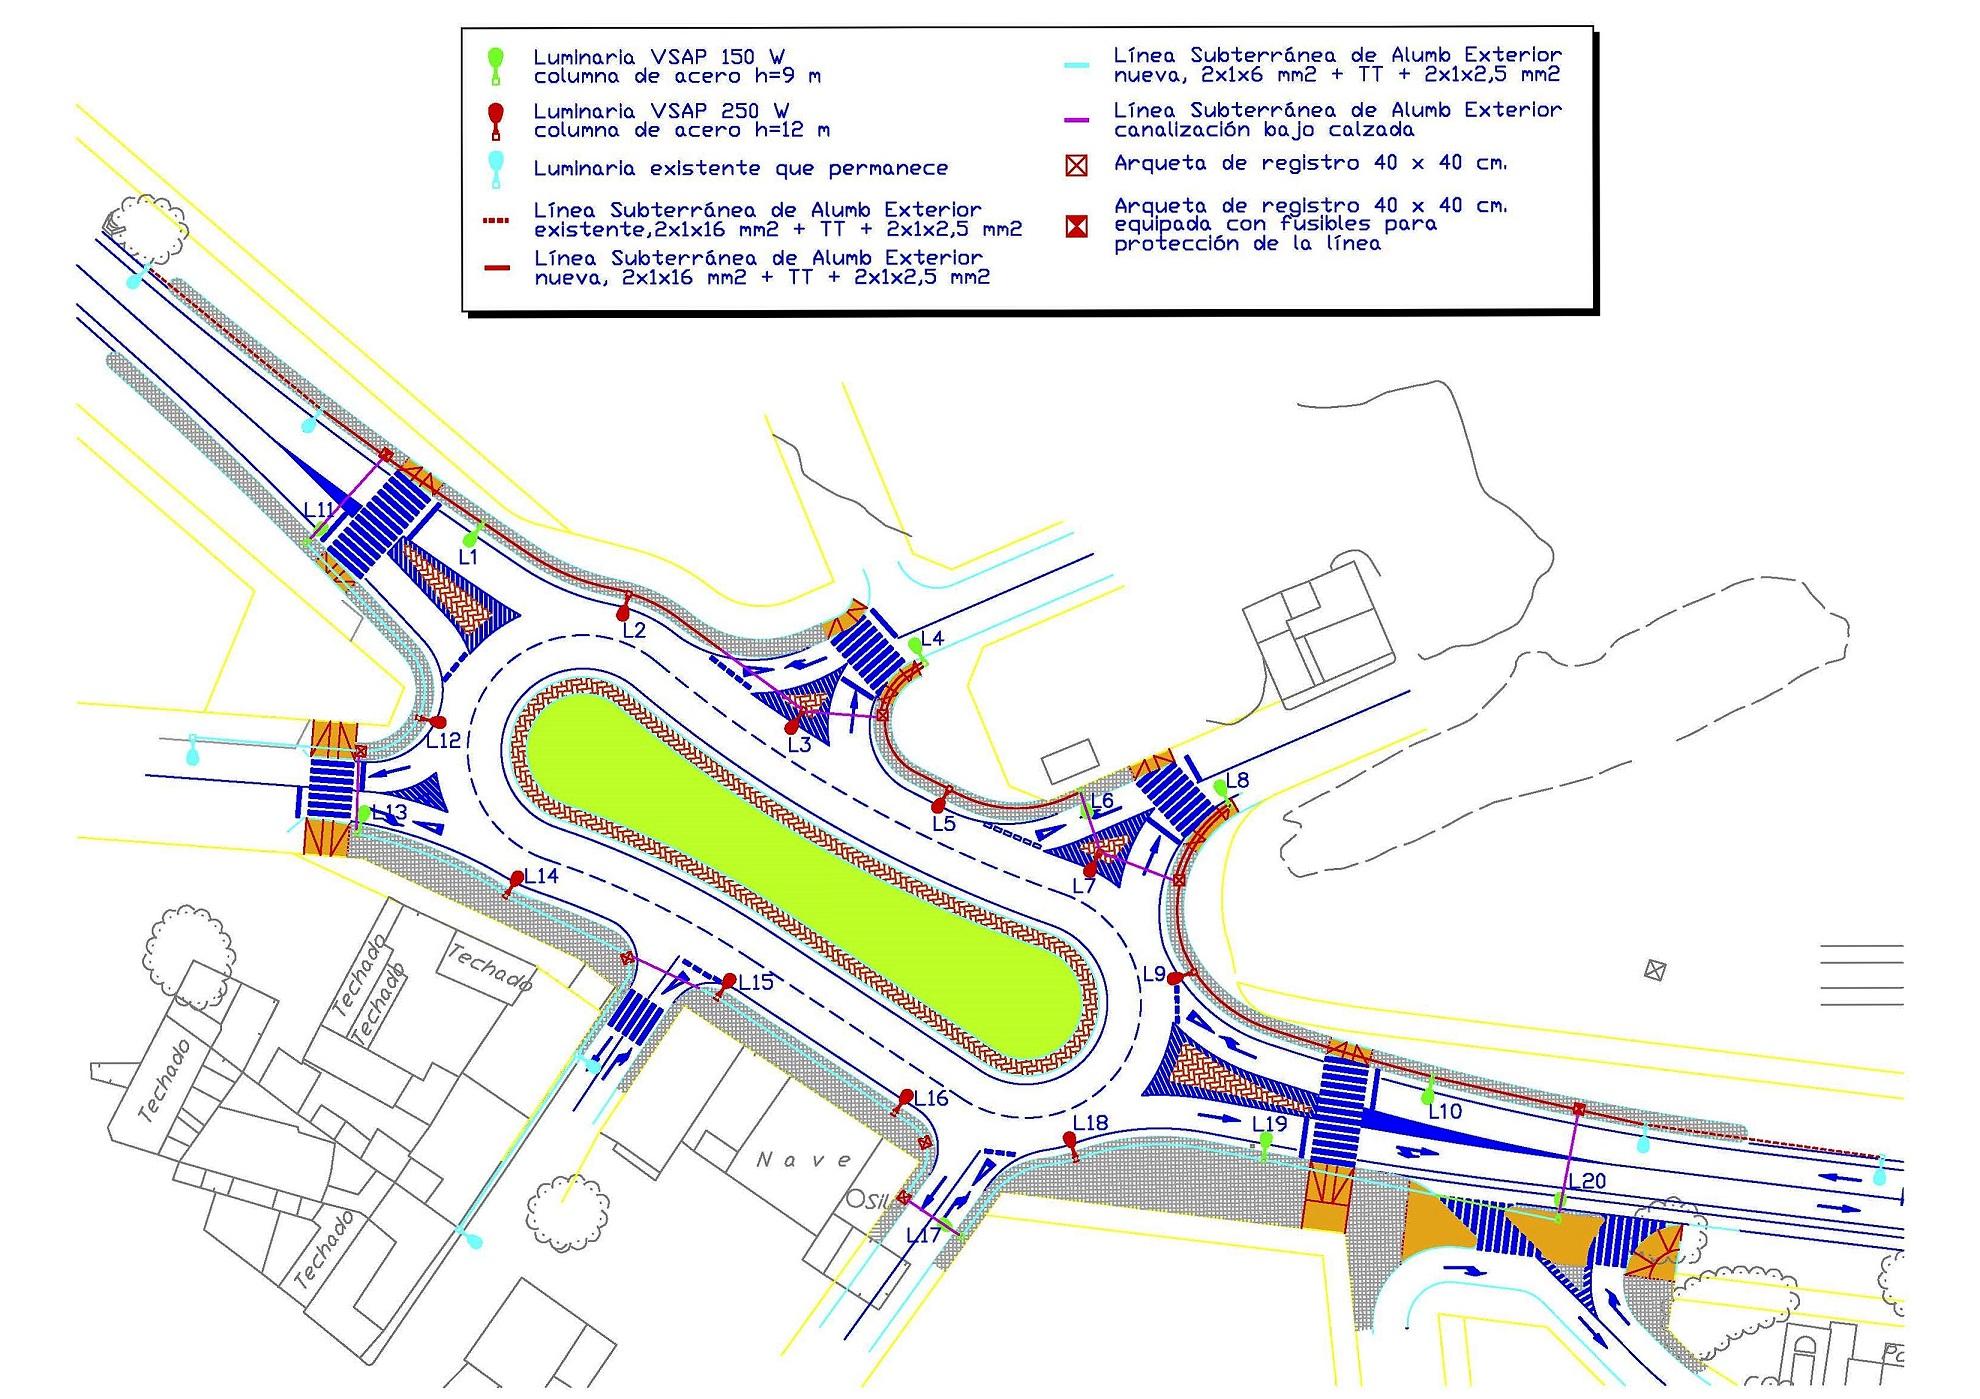 Proyecto de Alumbrado para glorieta en la Avenida Principe de Asturias en pedanía de Paretón, Totana, Murcia